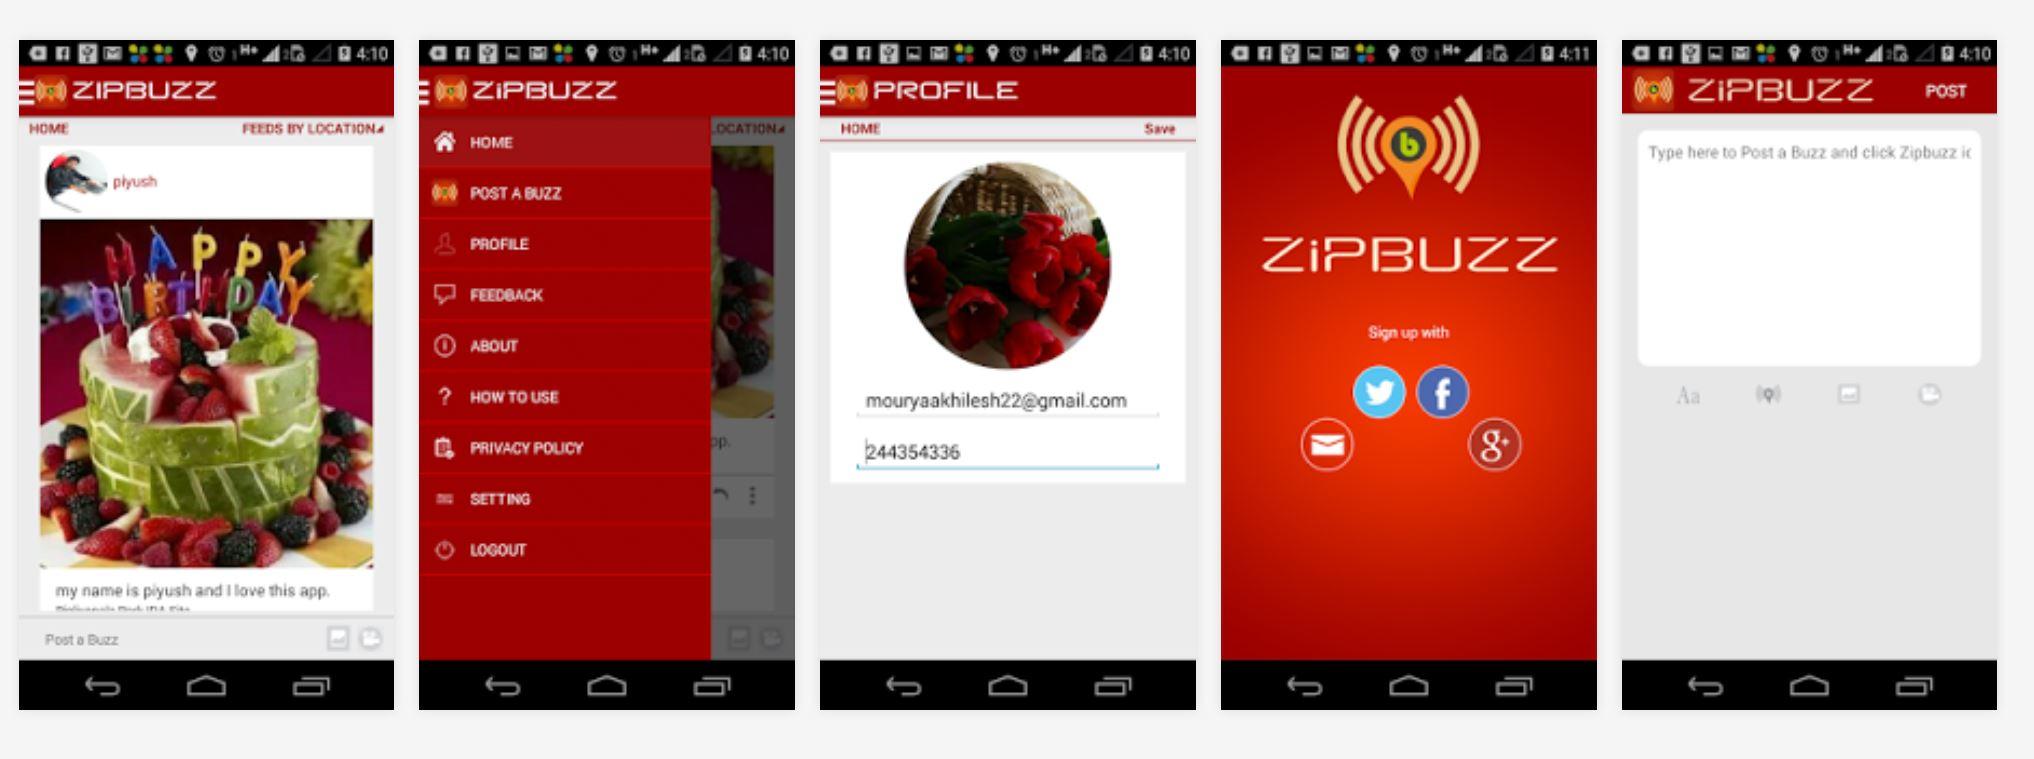 Zipbuzz-1